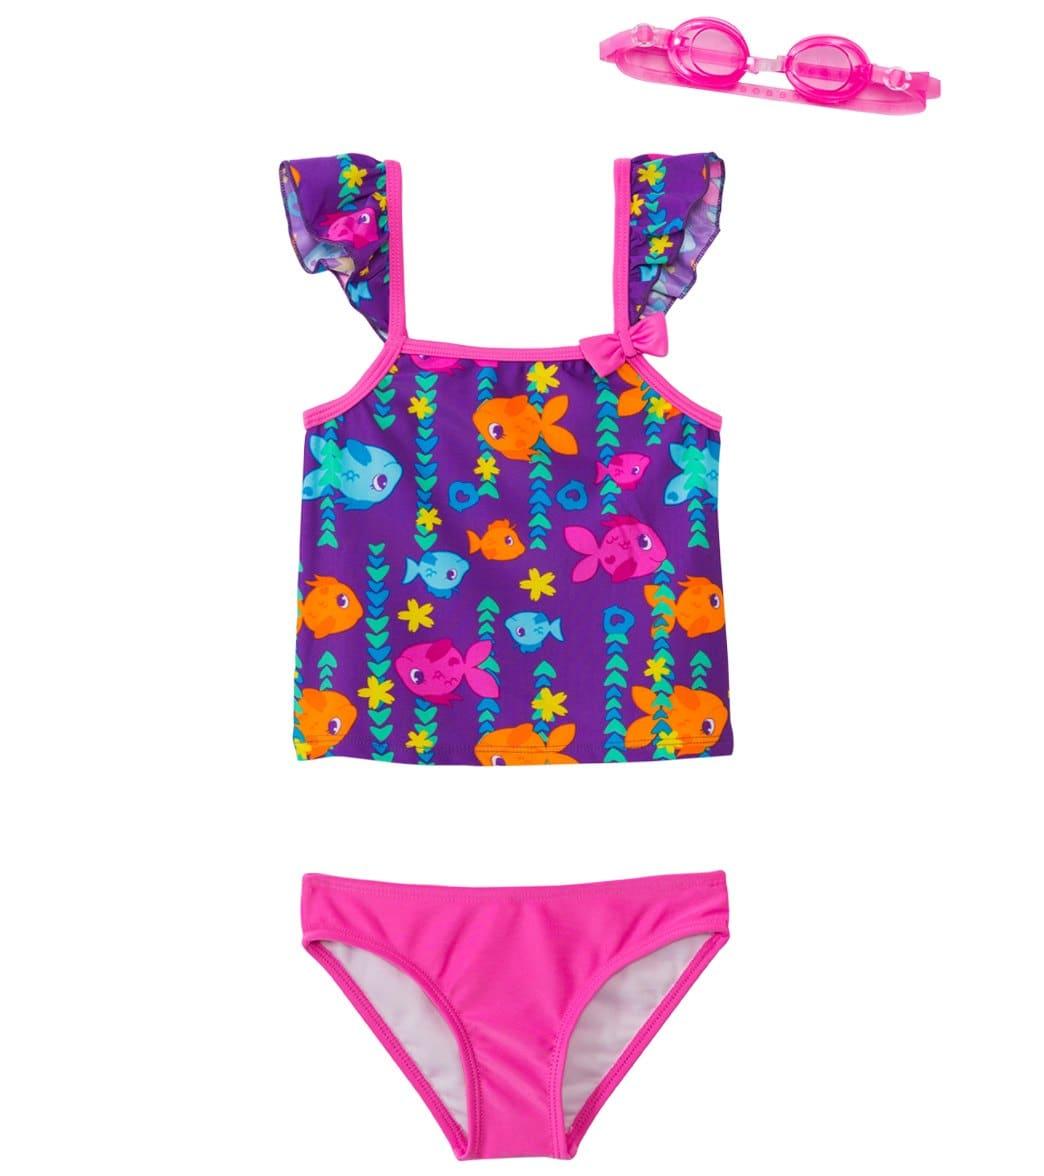 bd81e6587f Jump N Splash Girls' Fab Fish Two-Piece Swimsuit w/ Free Goggles (4 ...